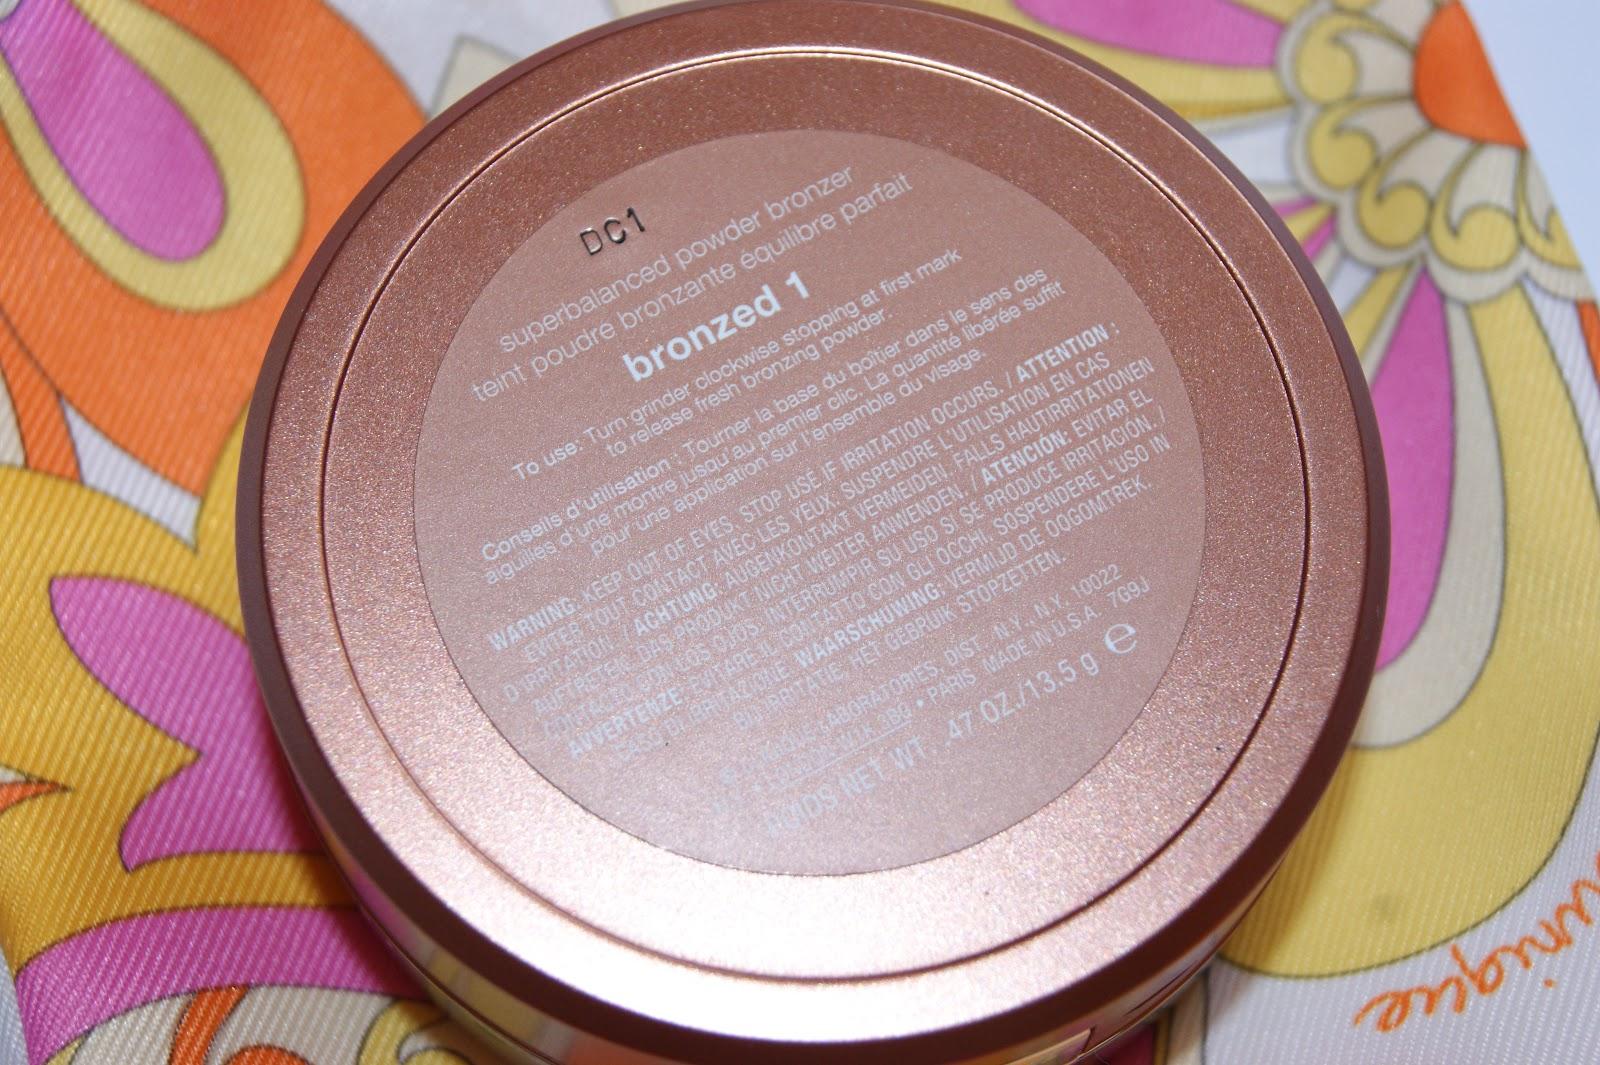 Superbalanced Powder Bronzer by Clinique #13